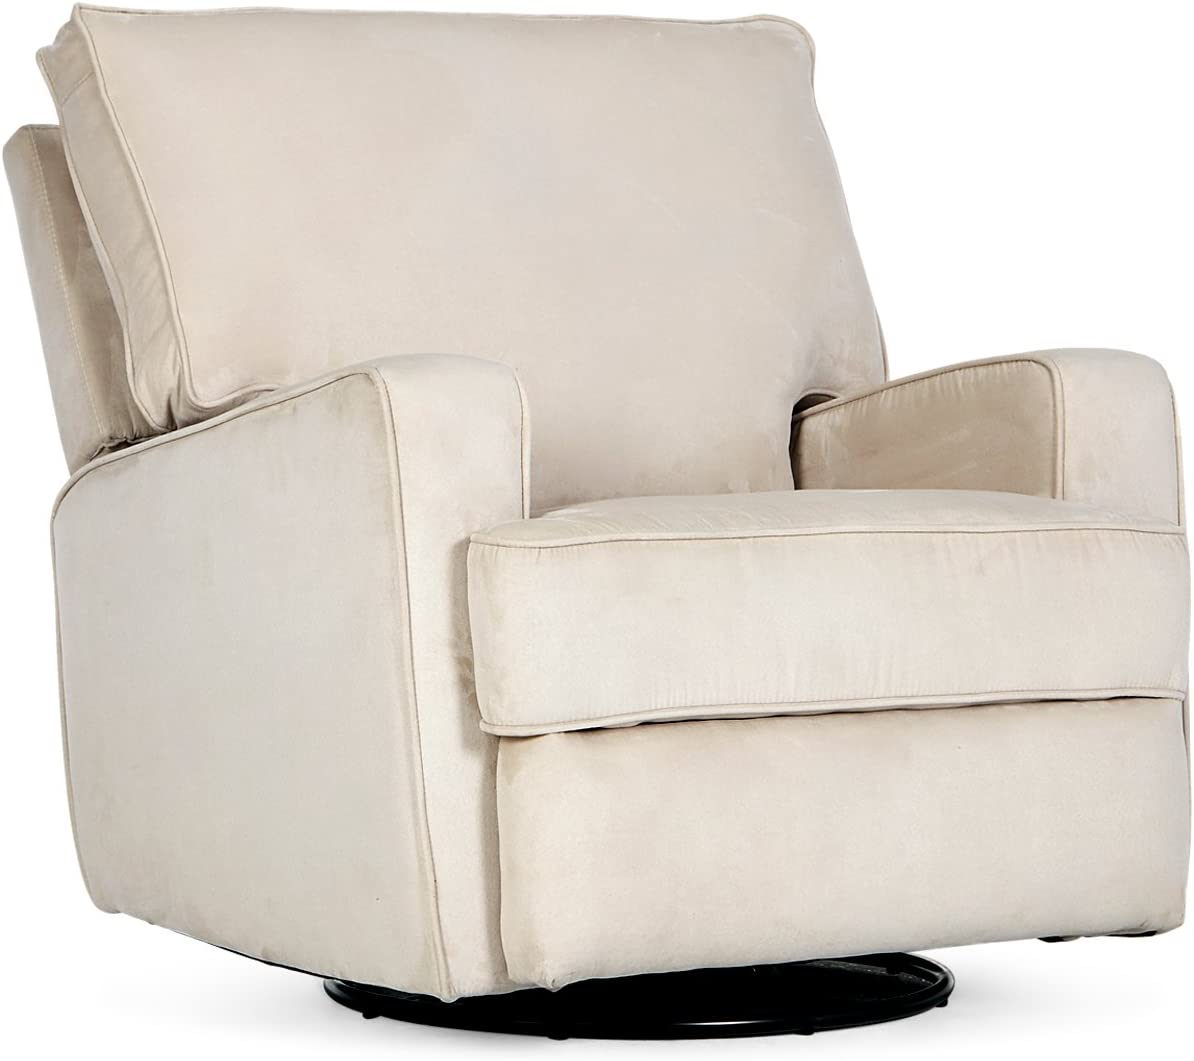 BELLEZE Recliner Swivel Chair Armrest Padded Backrest Living Room Rocker Reclining Chairs Comfort Footrest Linen, Beige